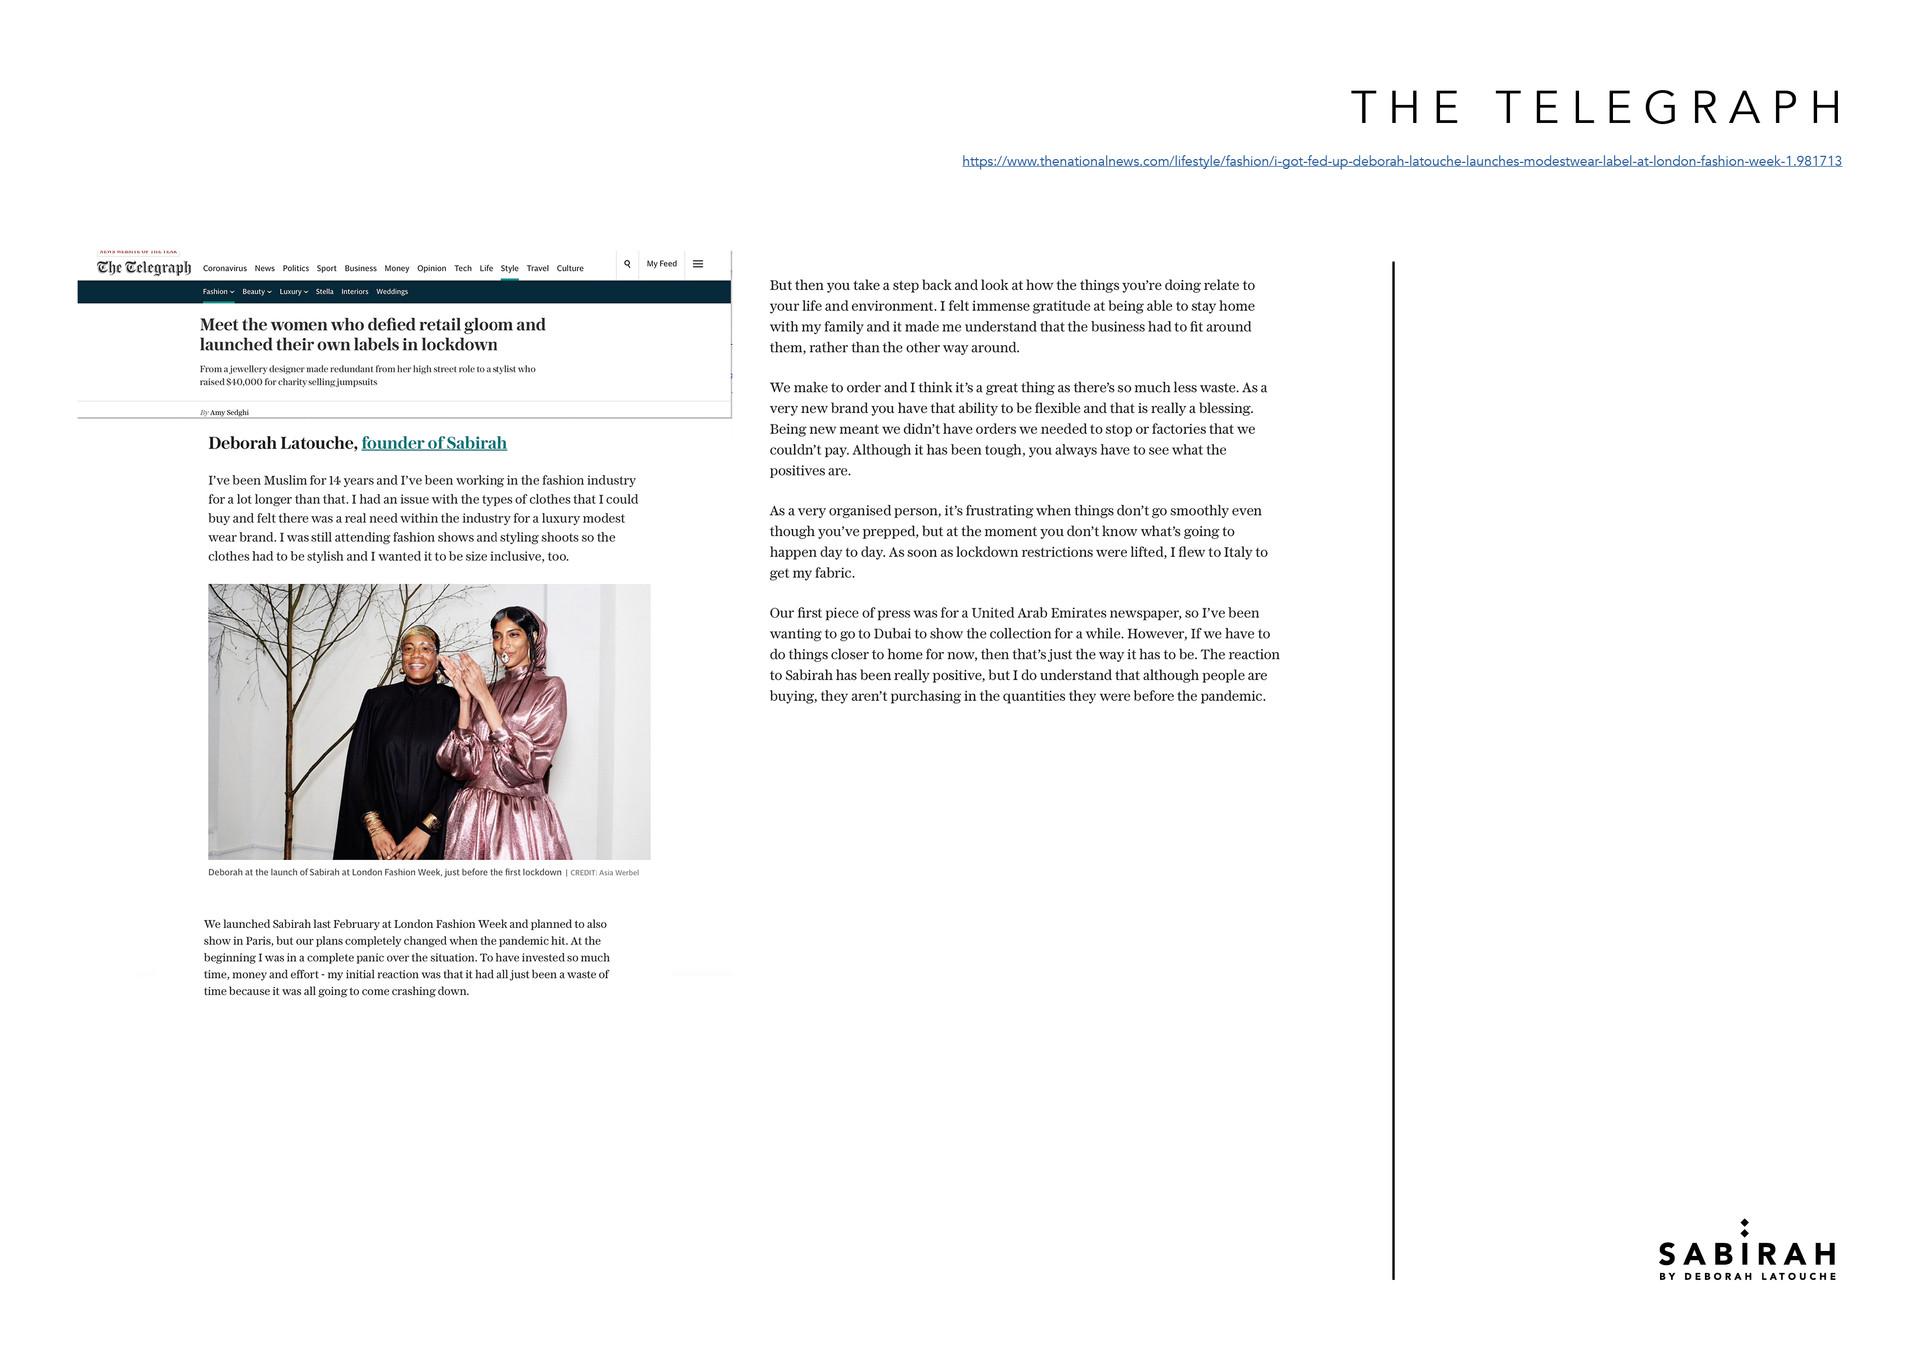 Sabirah_press book18.jpg